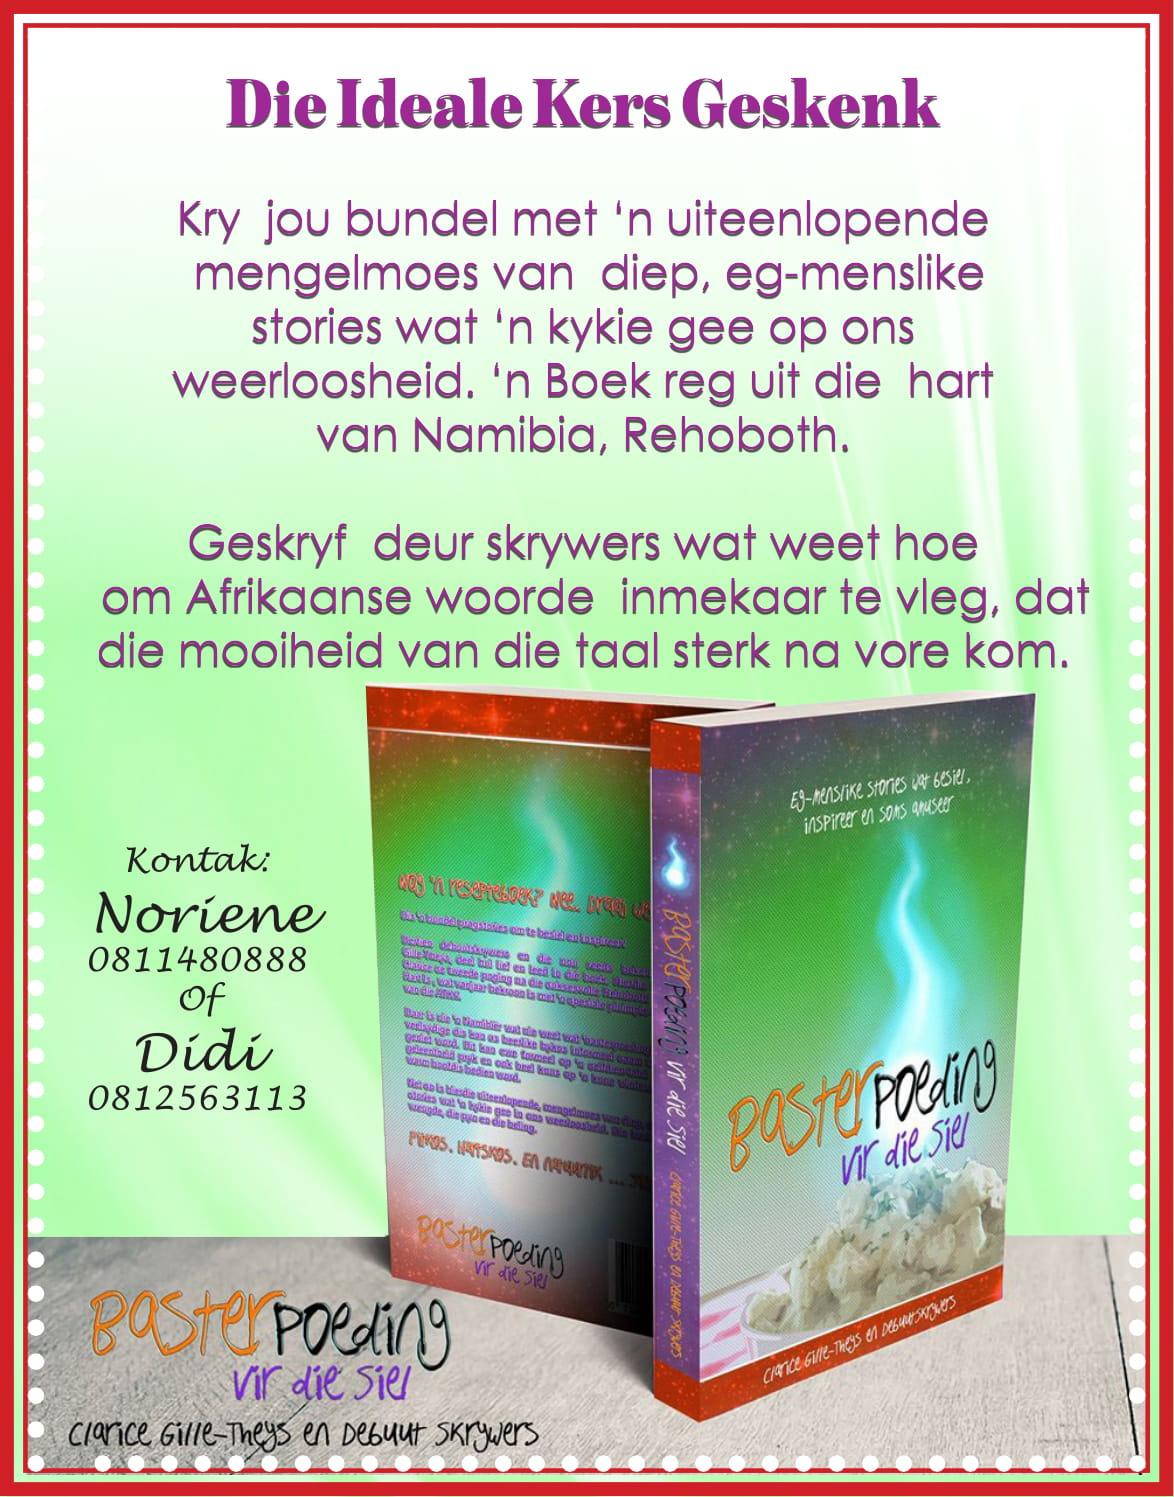 Book Launch - Basterpoeding